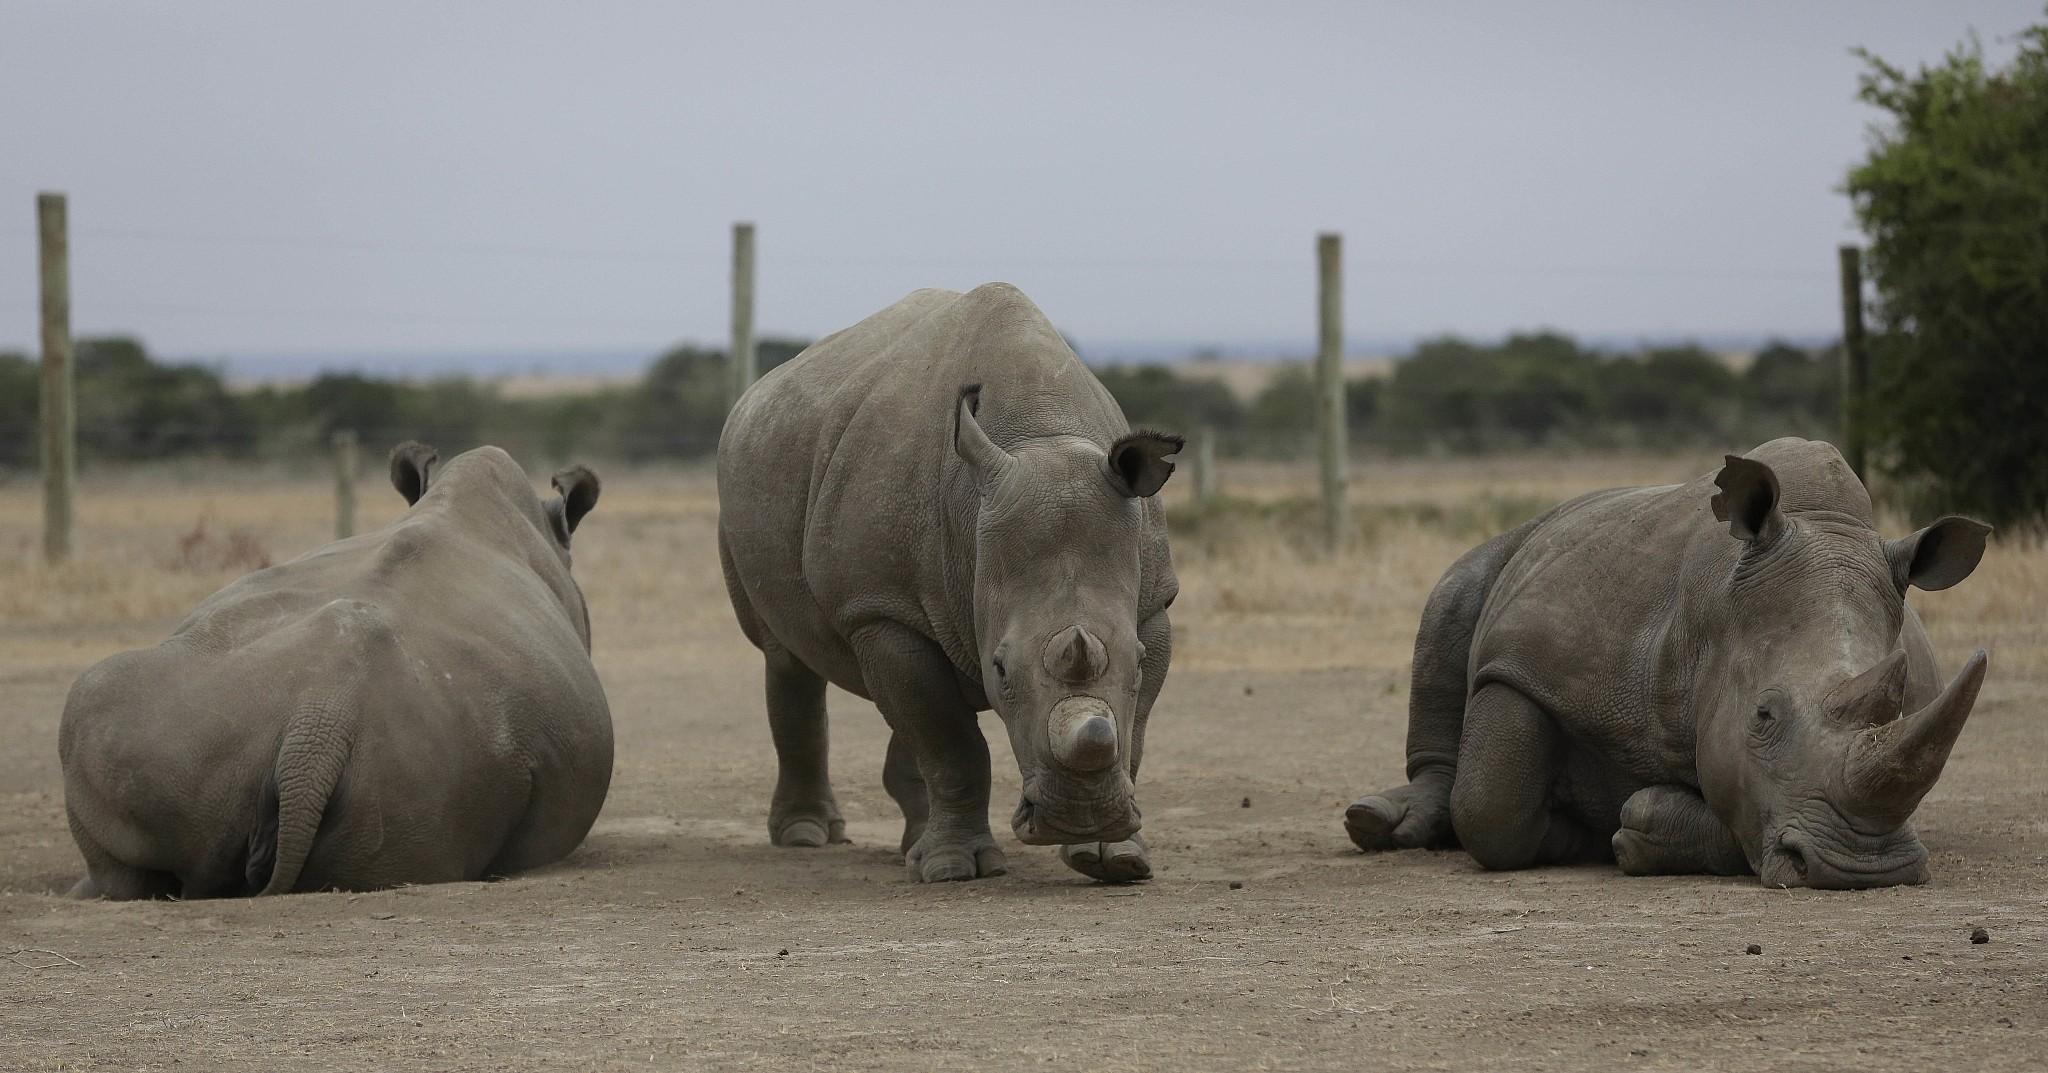 Last male northern white rhino dies in Kenya | The Times of